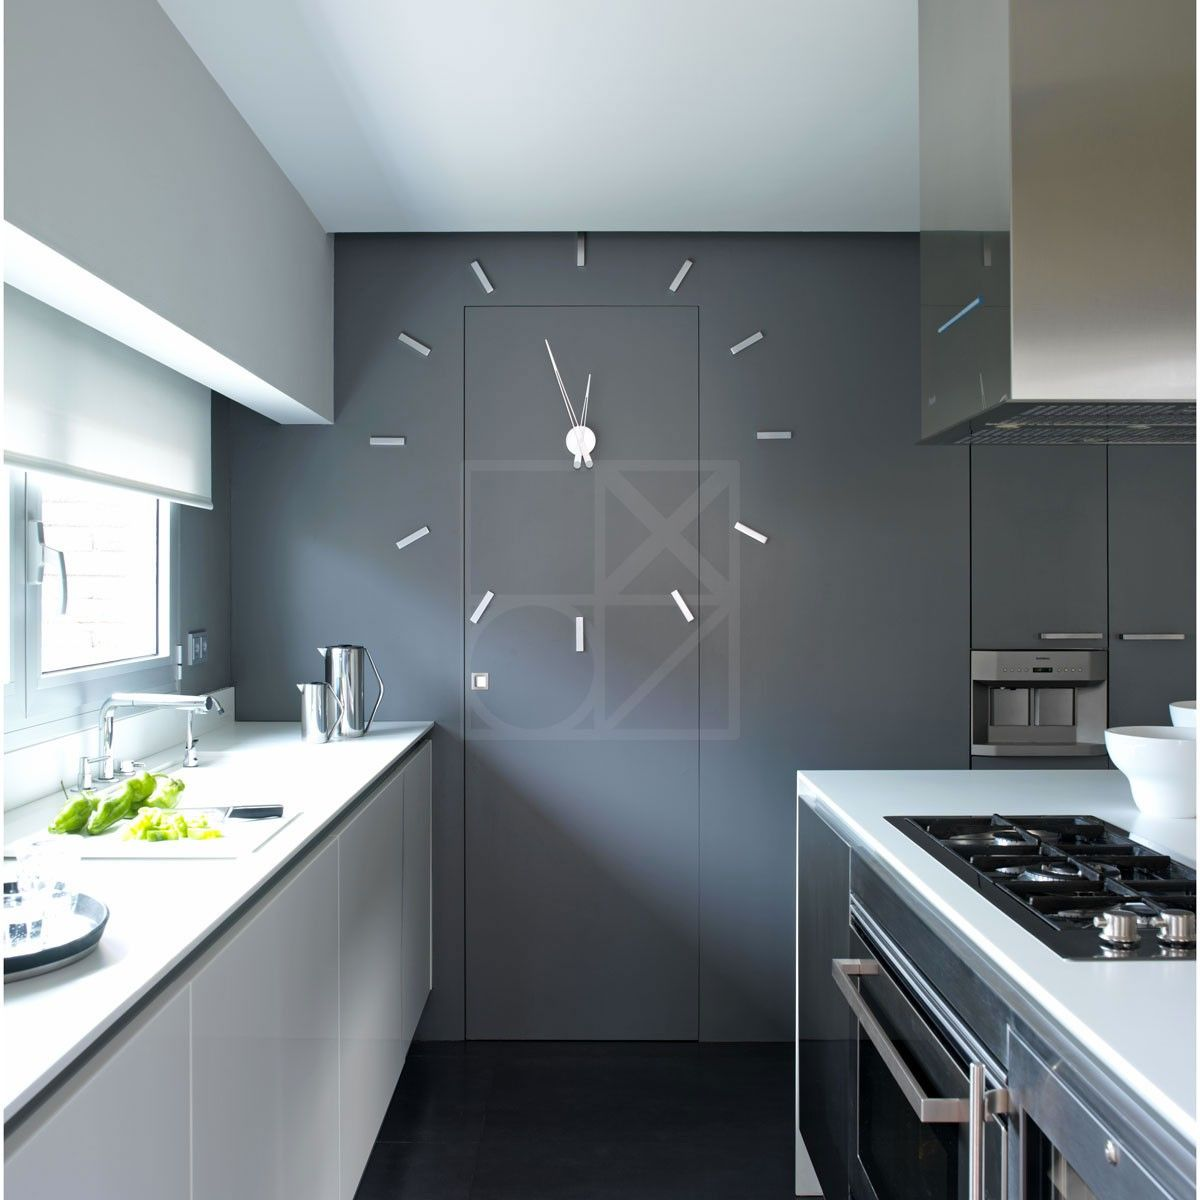 Horloge murale design horloge nomon tacon 12 quelle - Horloges murales cuisine ...